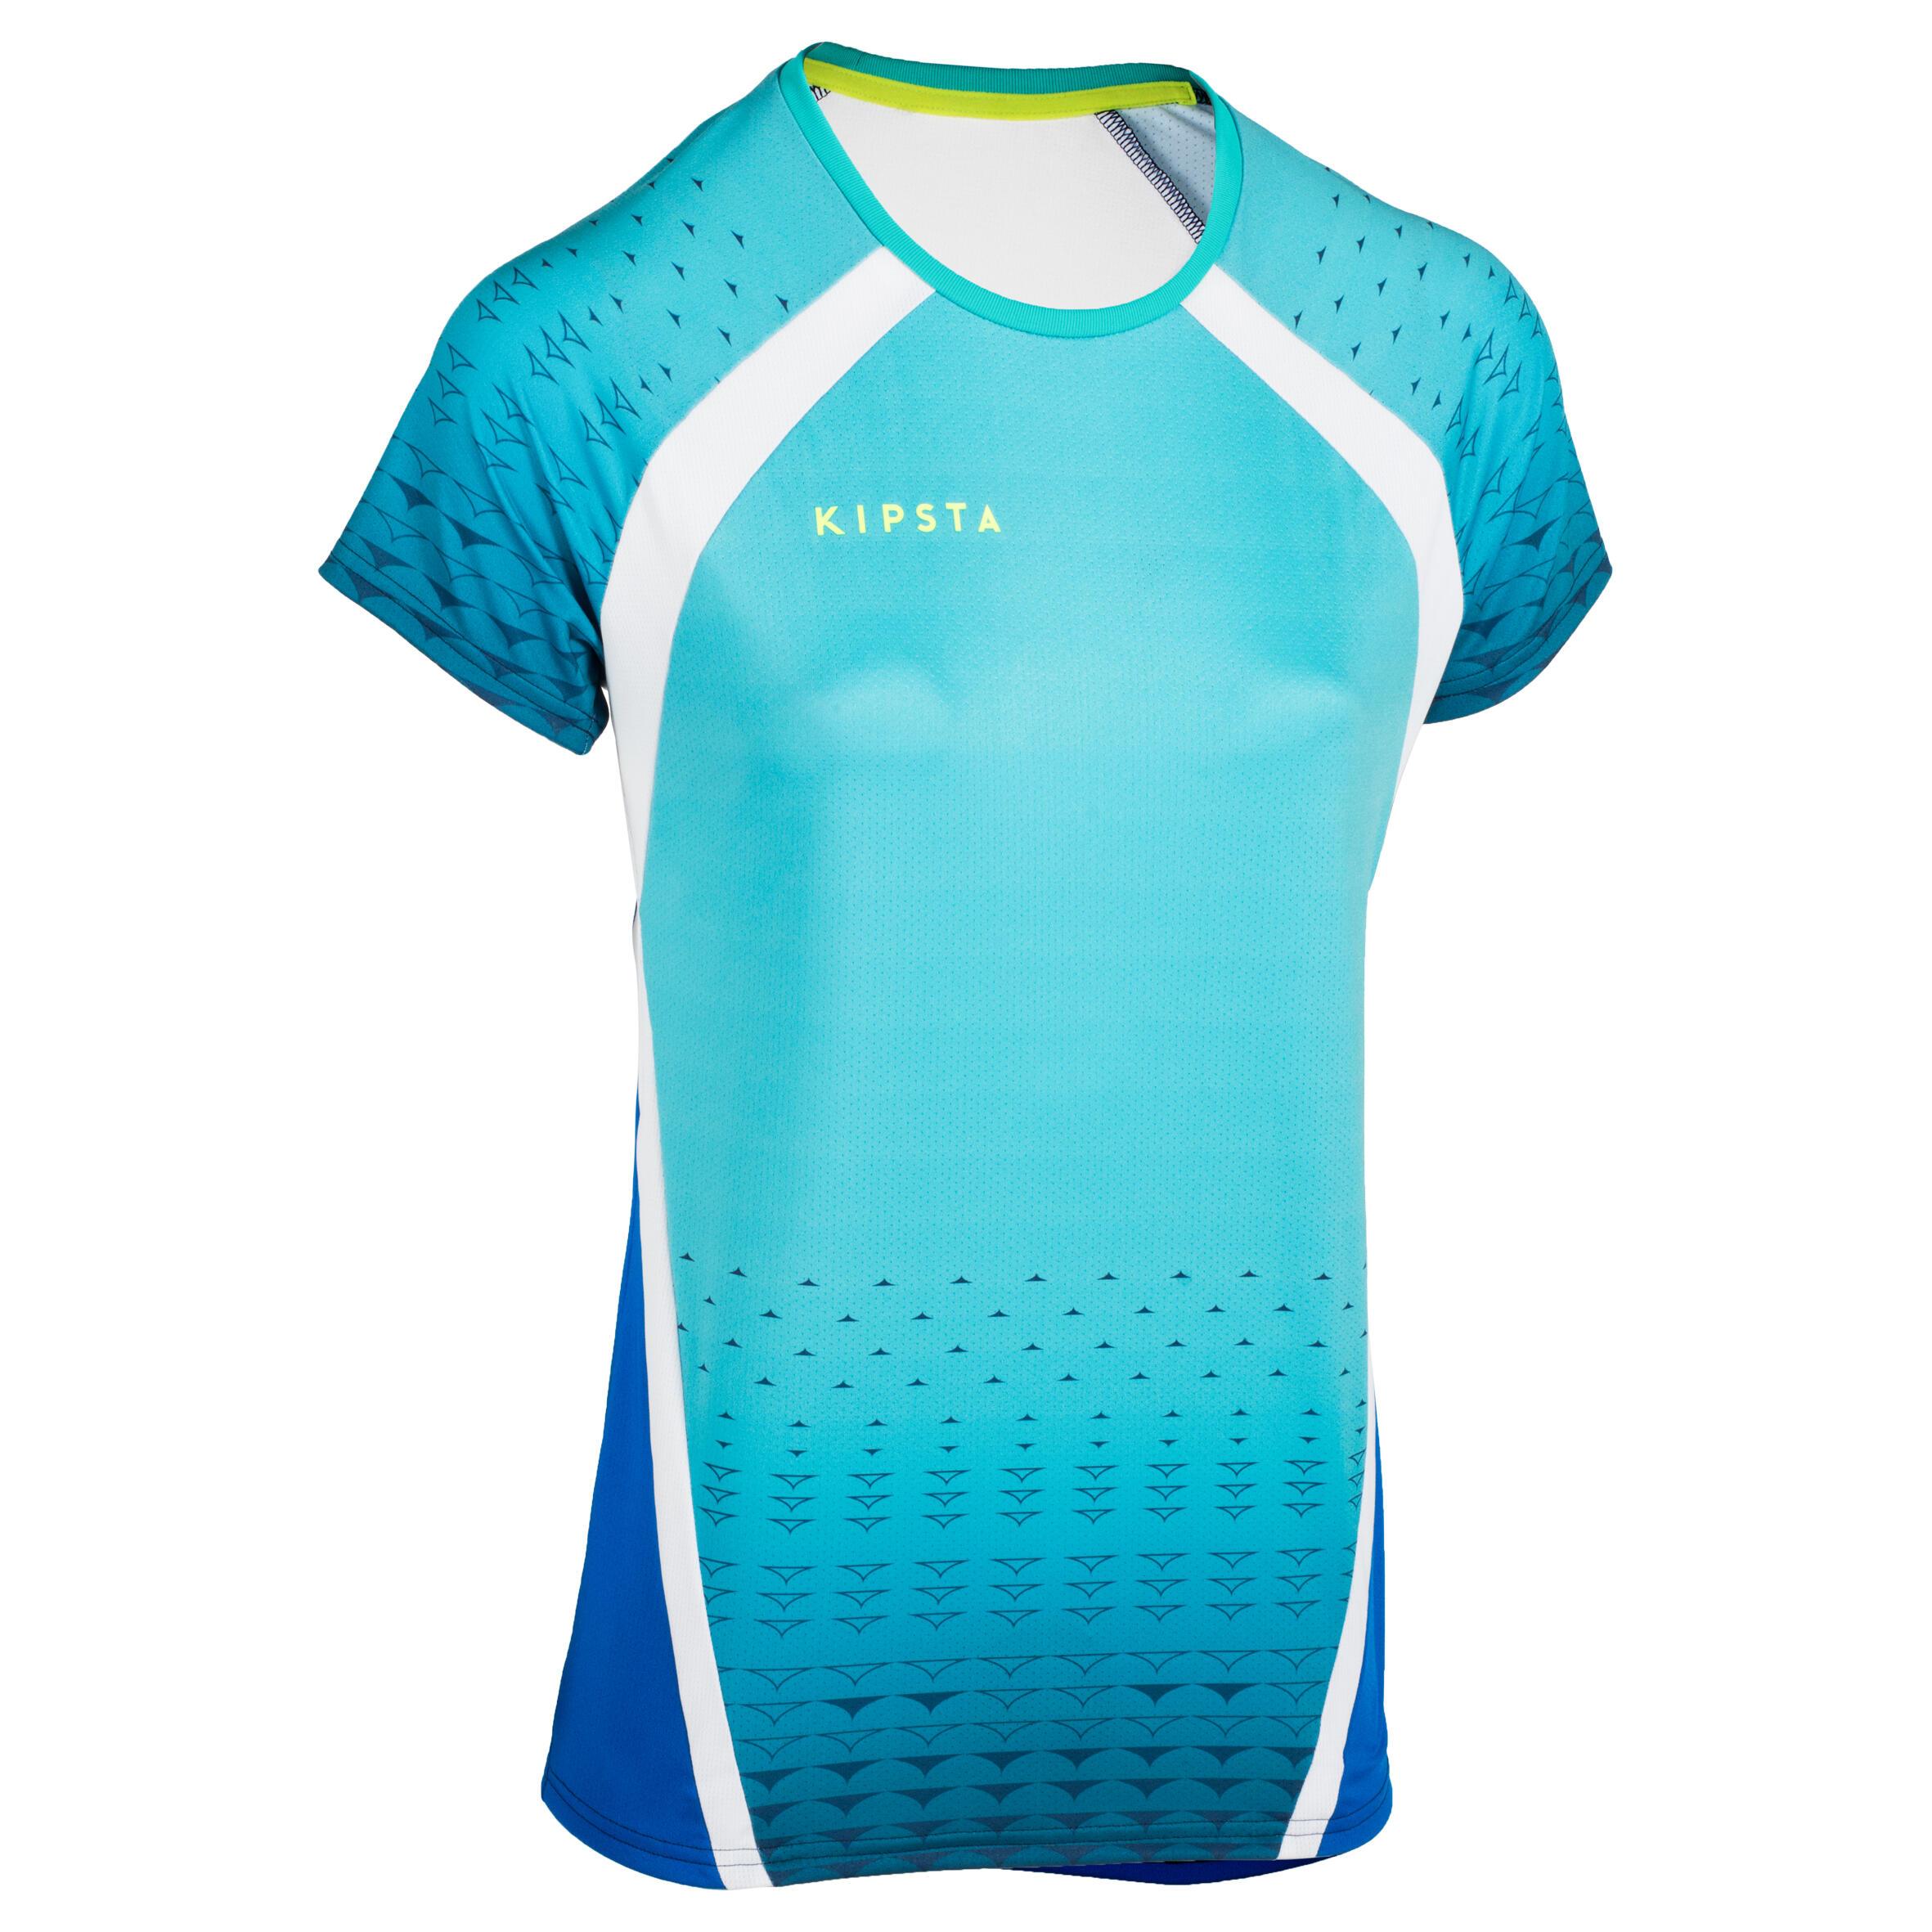 Allsix Volleybalshirt V500 voor dames